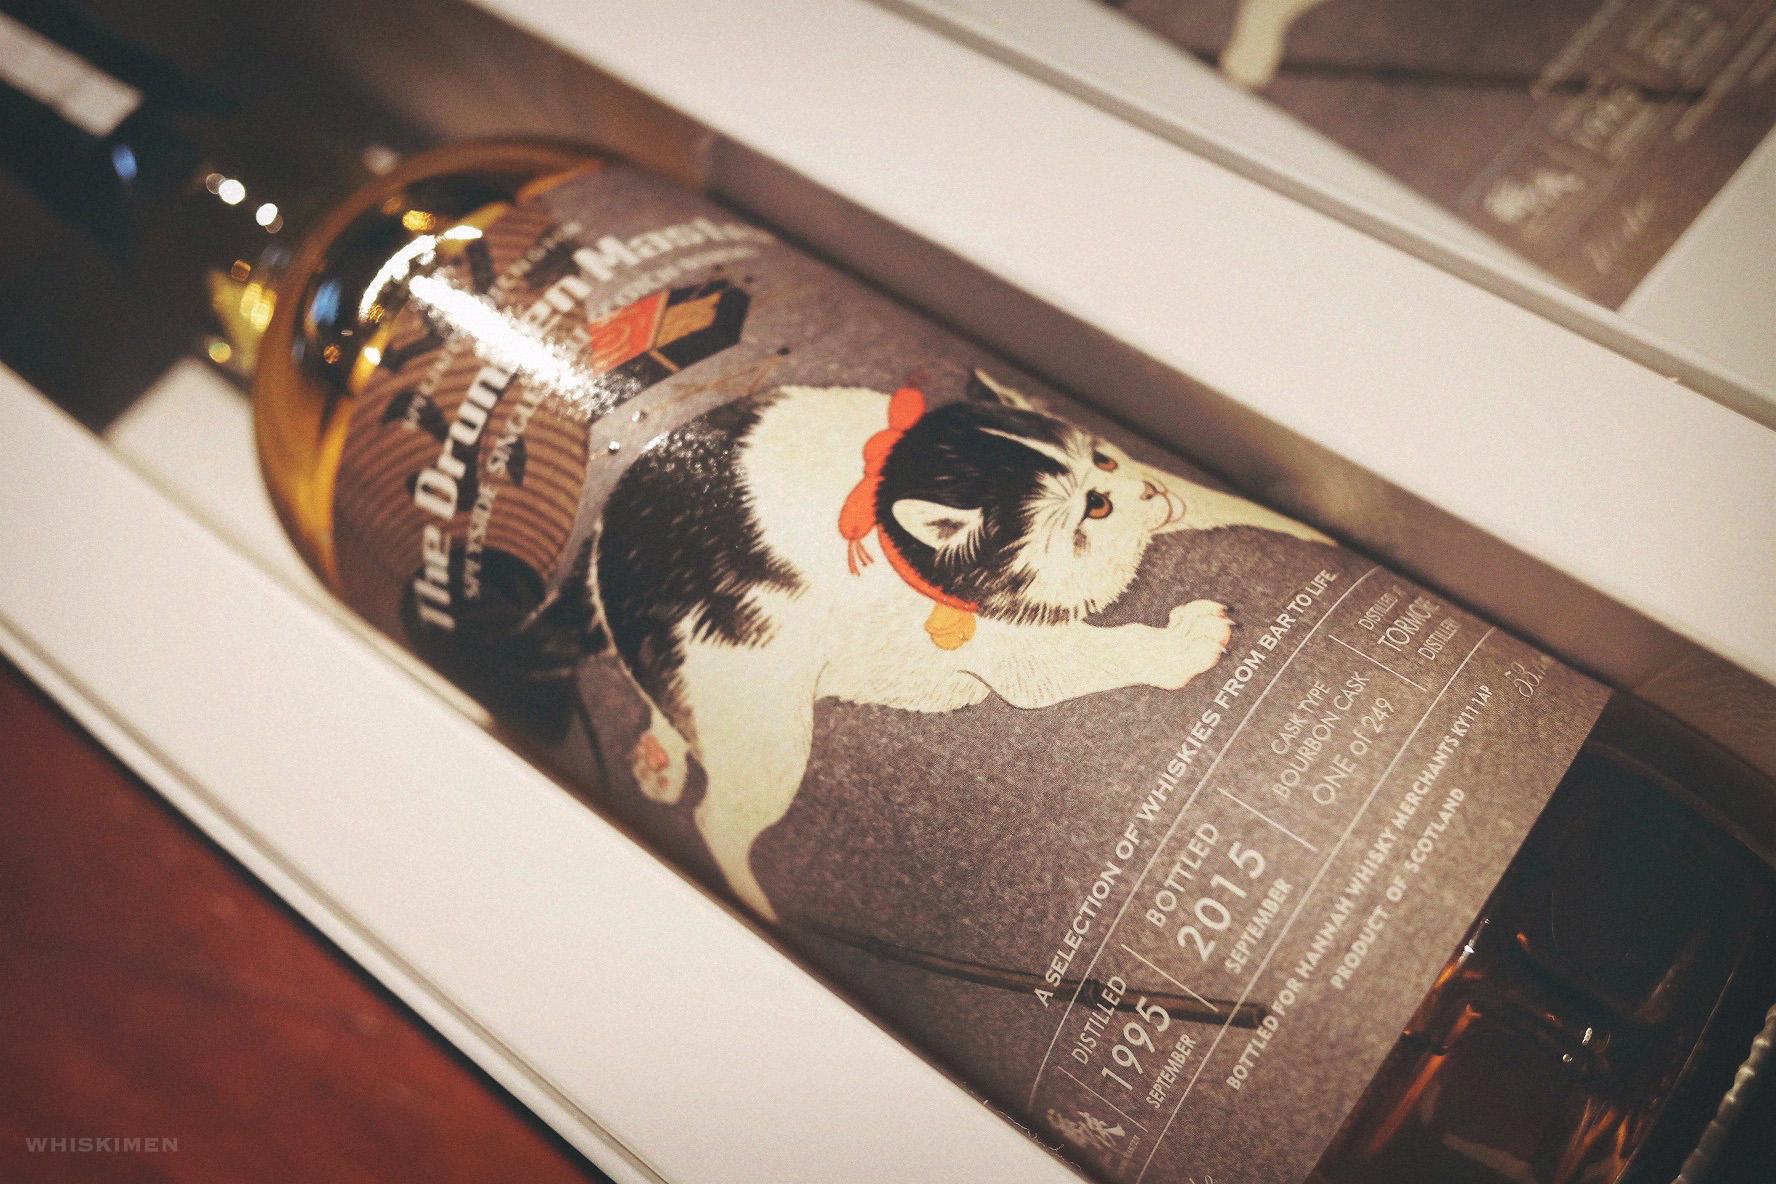 Lady Of The Glen The Drunken Master Tormore 1995 19 Year Old Single Malt Whisky (Bar To Life), bourbon, cat, 貓, 醉俠, Hannah Whisky Merchants, kaohsiung